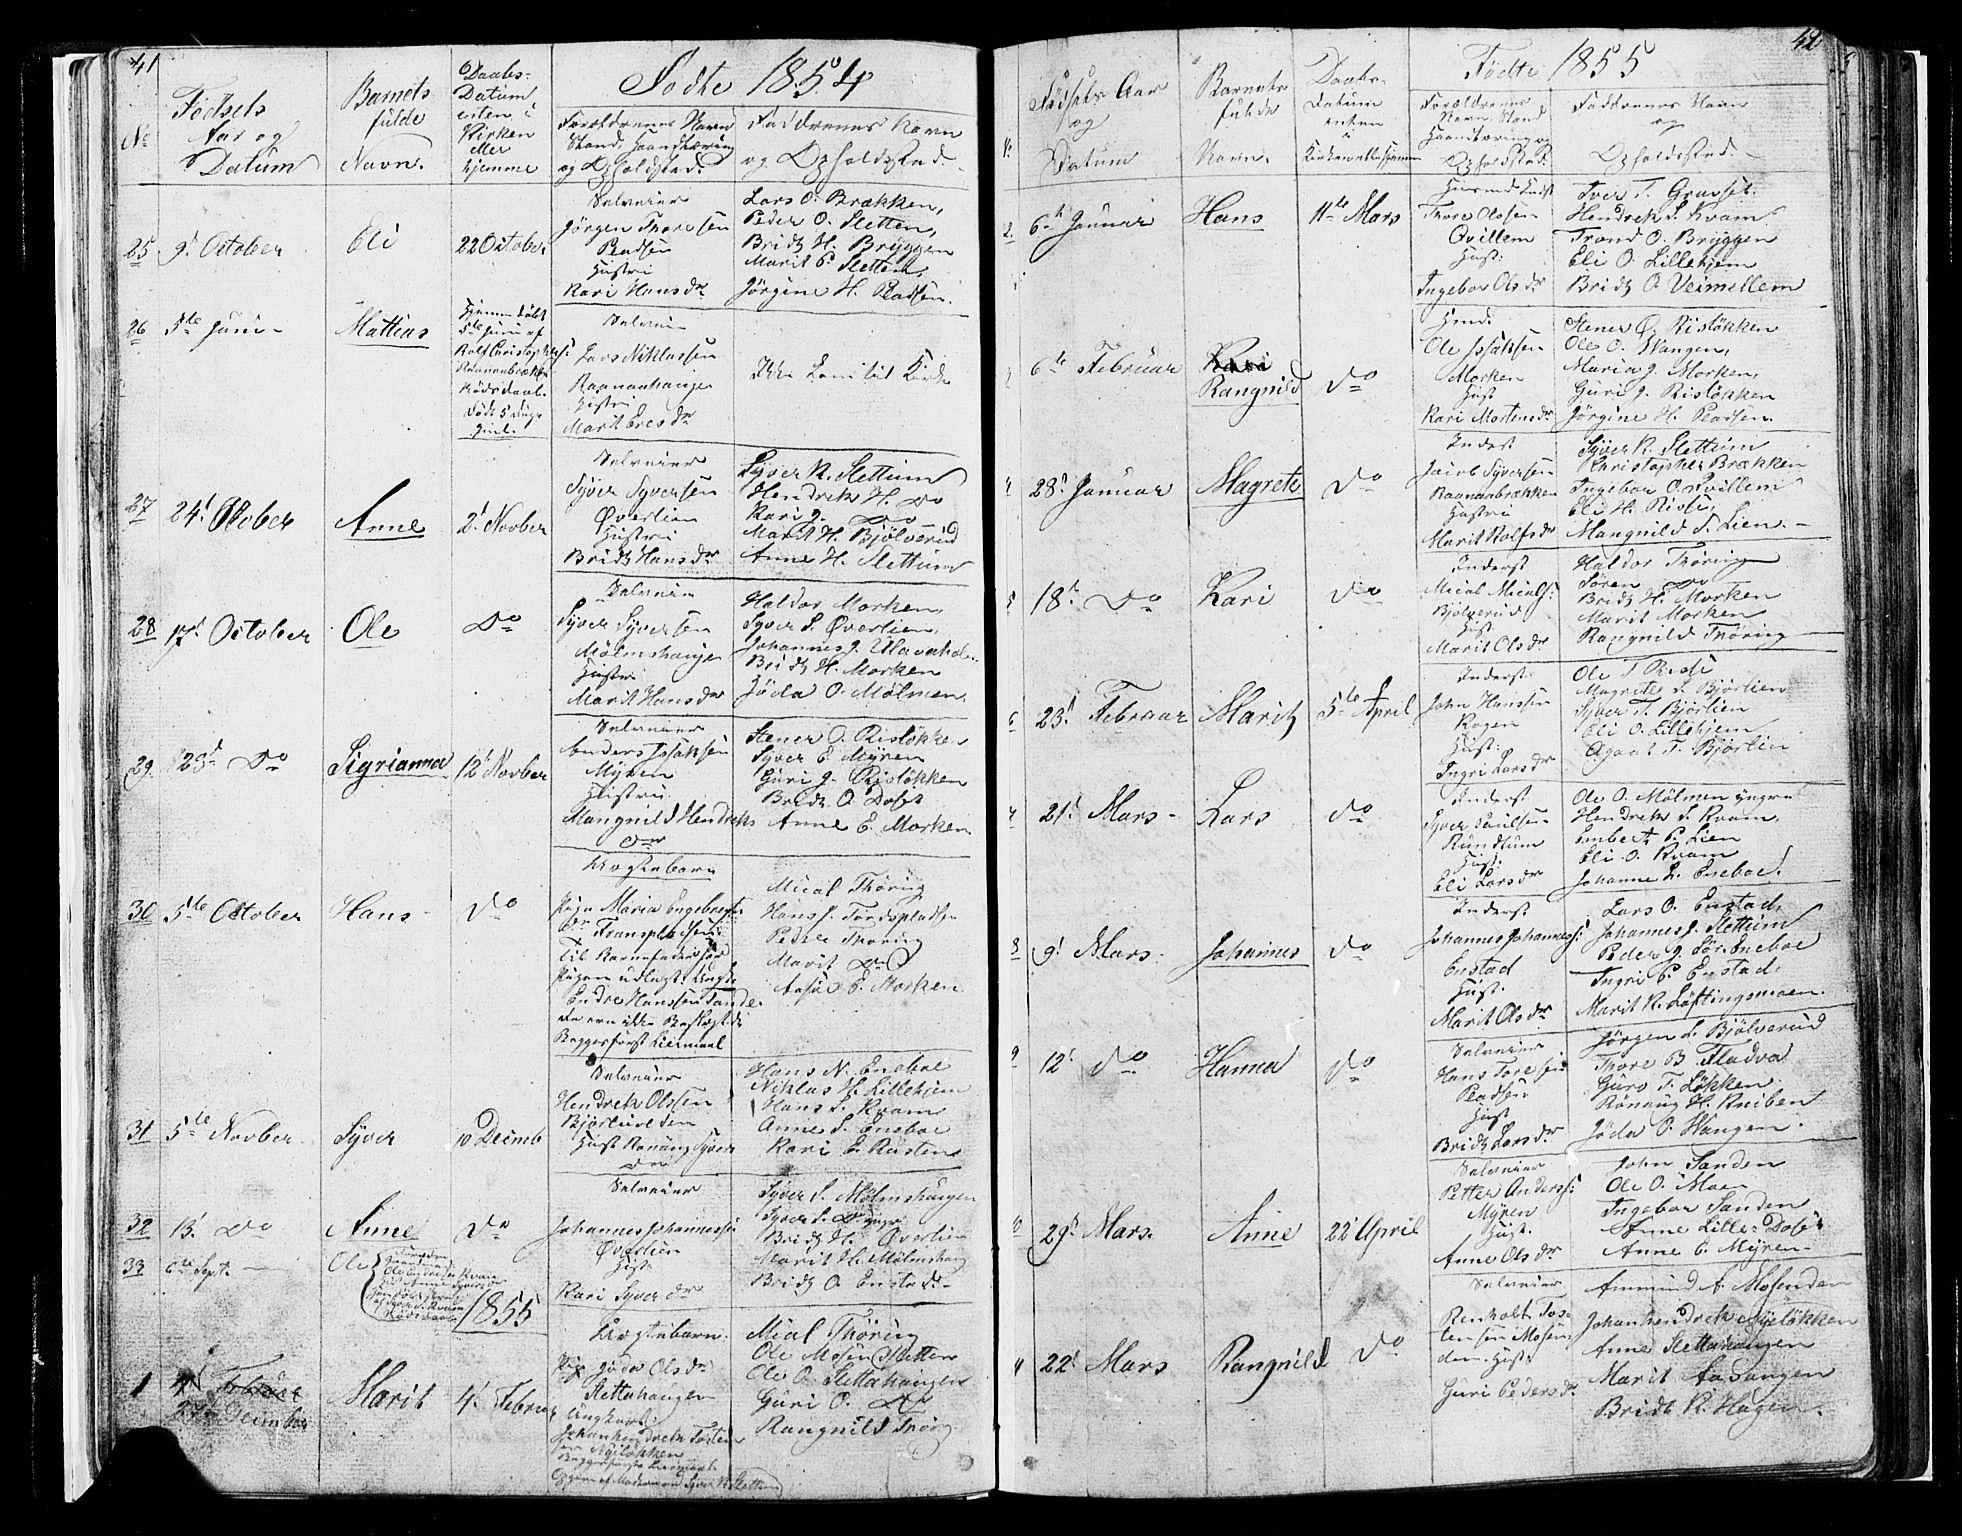 SAH, Lesja prestekontor, Klokkerbok nr. 4, 1842-1871, s. 41-42